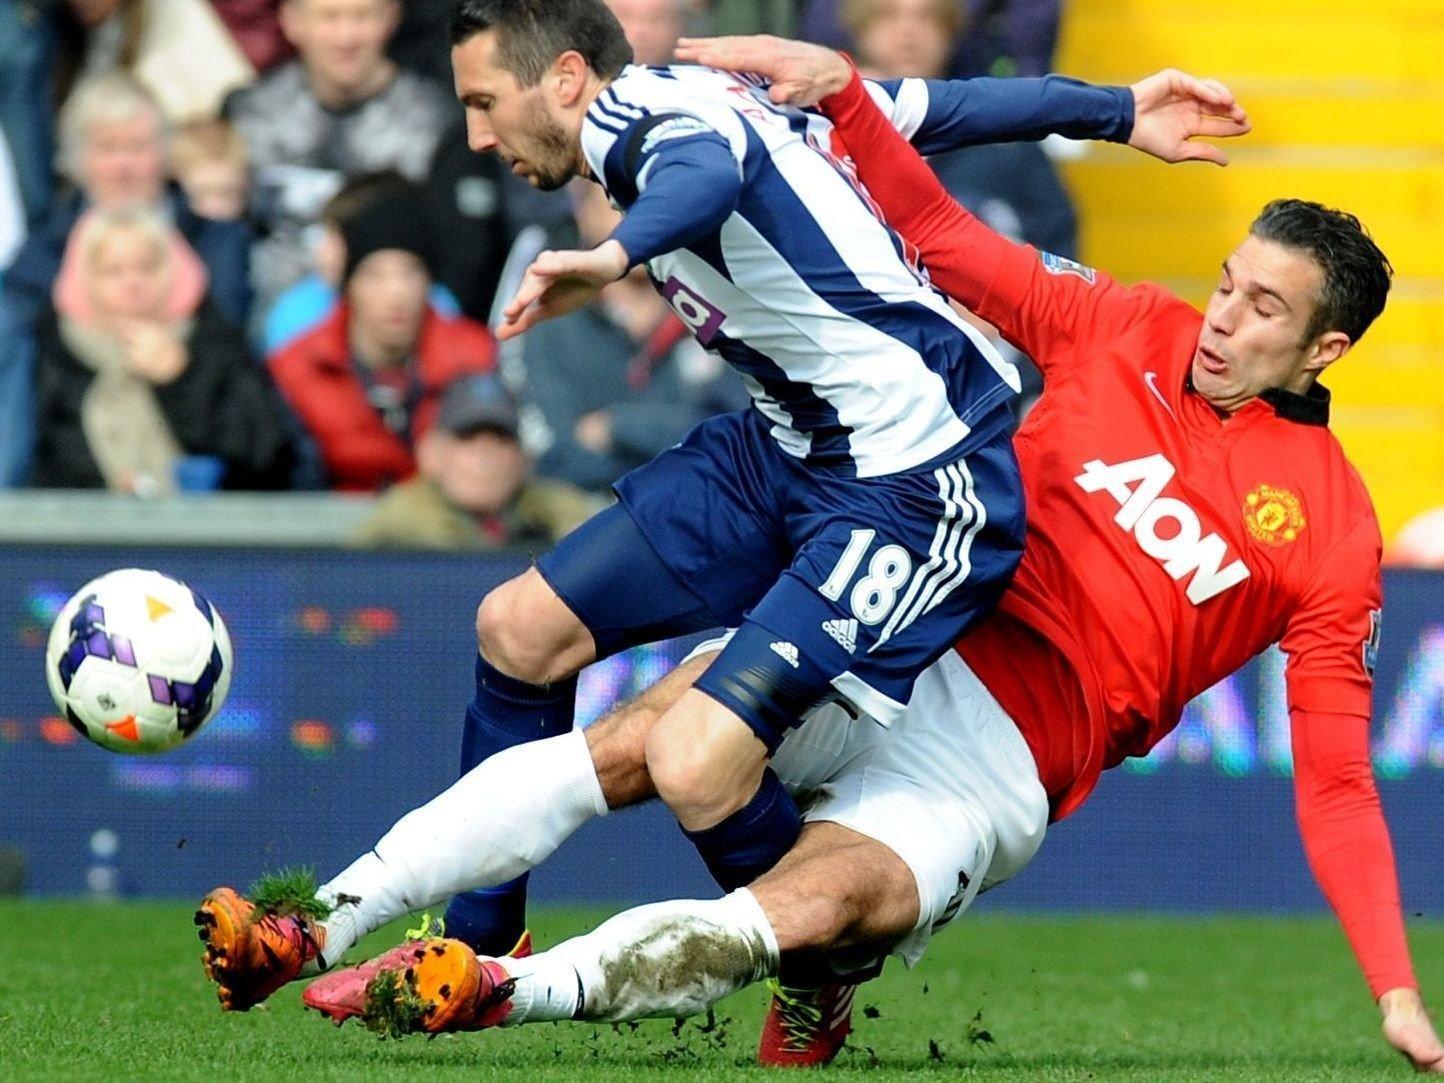 Manchester Uniteds Robin van Persie var heldig som slapp det røde kortet mot West Bromwich. Her takler han Morgan Amalfitano, en takling som ga ham gult kort. Foto: AP Photo/Rui Vieira